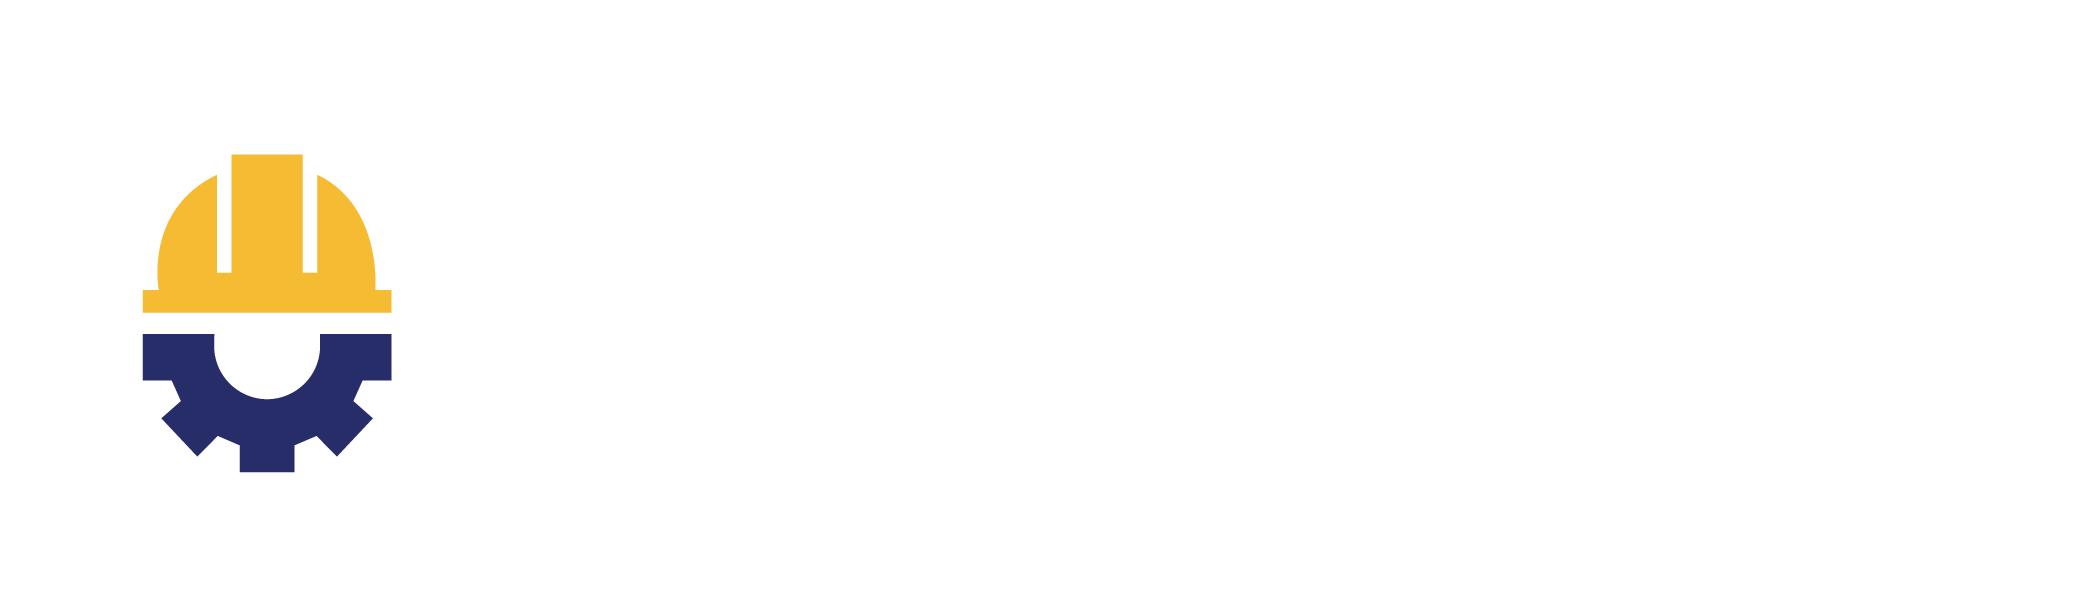 WhiteSource Slider